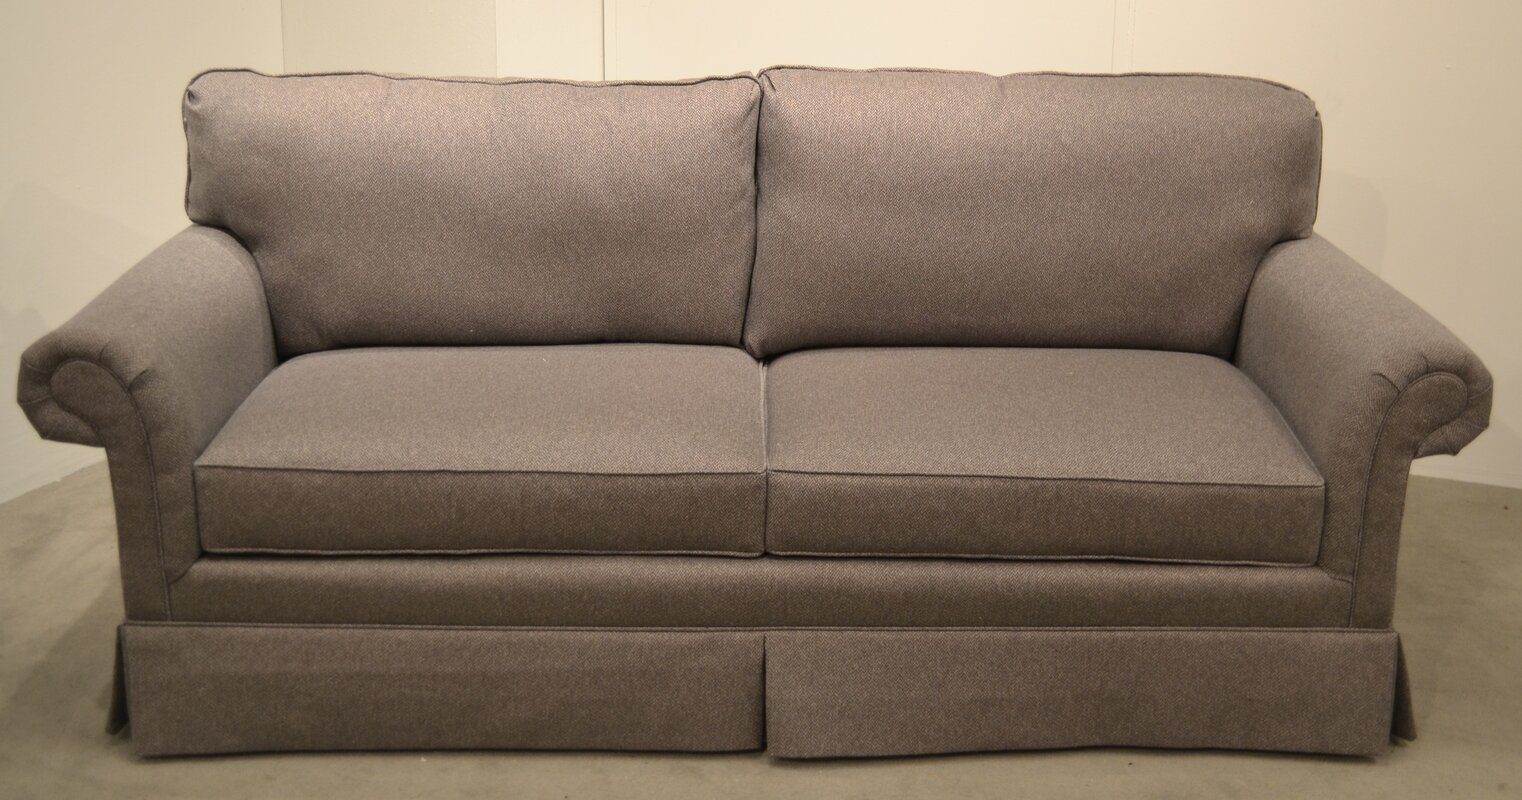 Great Two Cushion Sofa